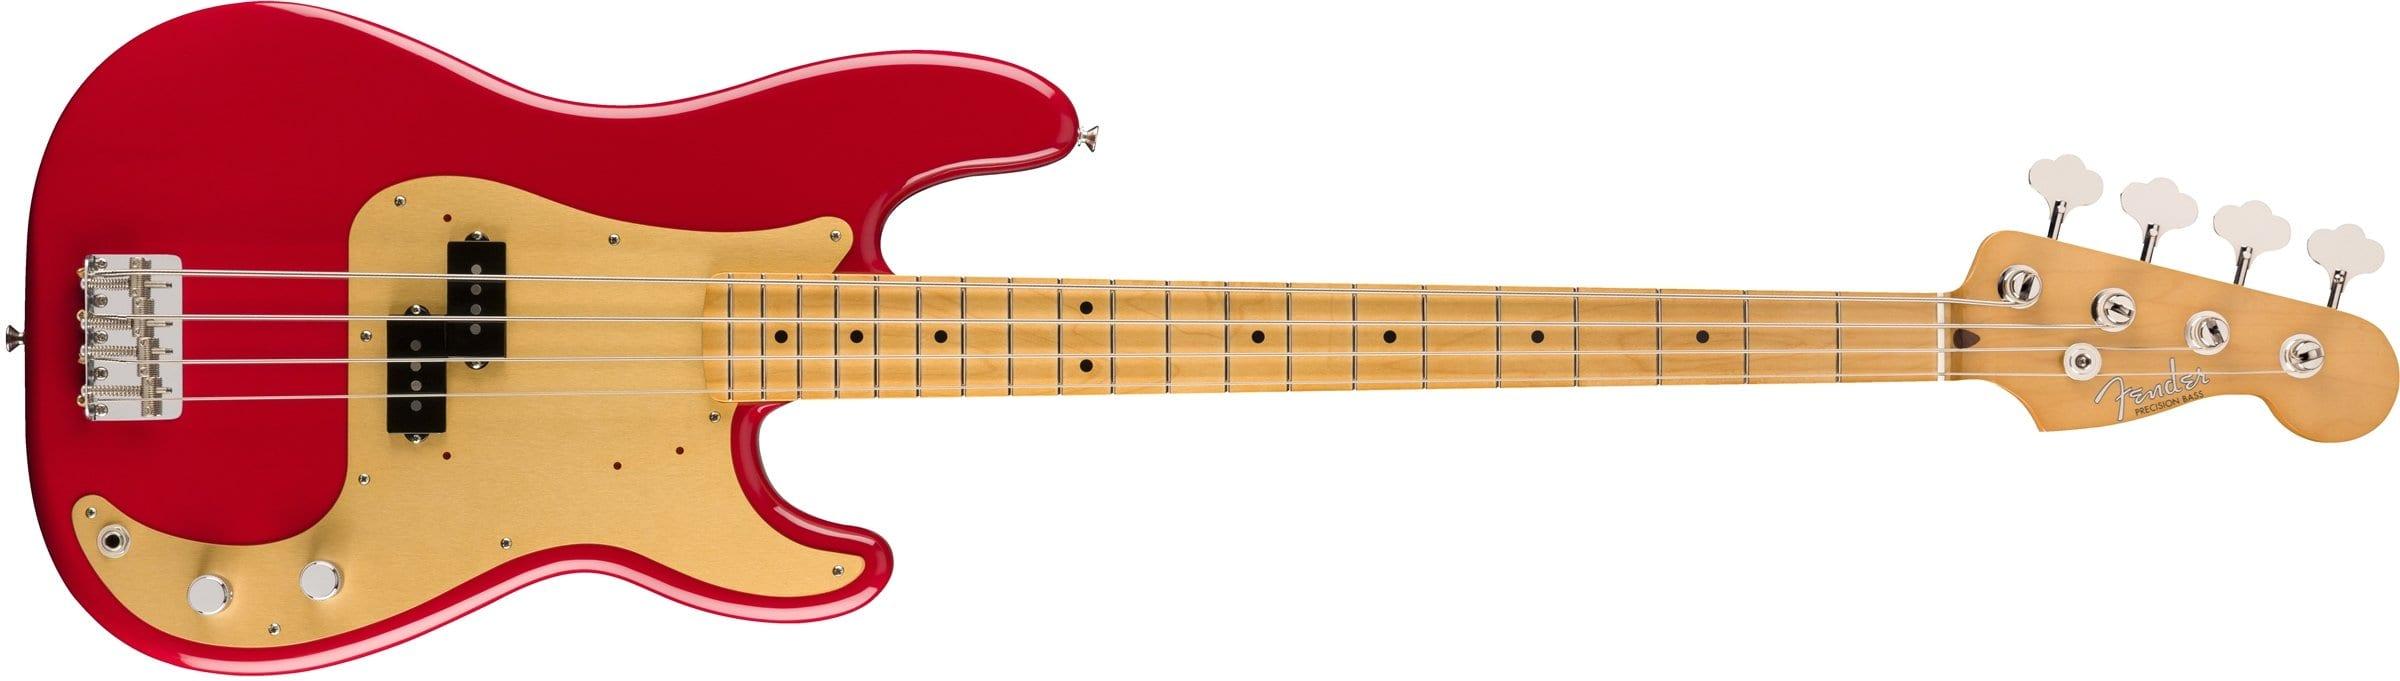 Fender Vintera 50s Precision Bass